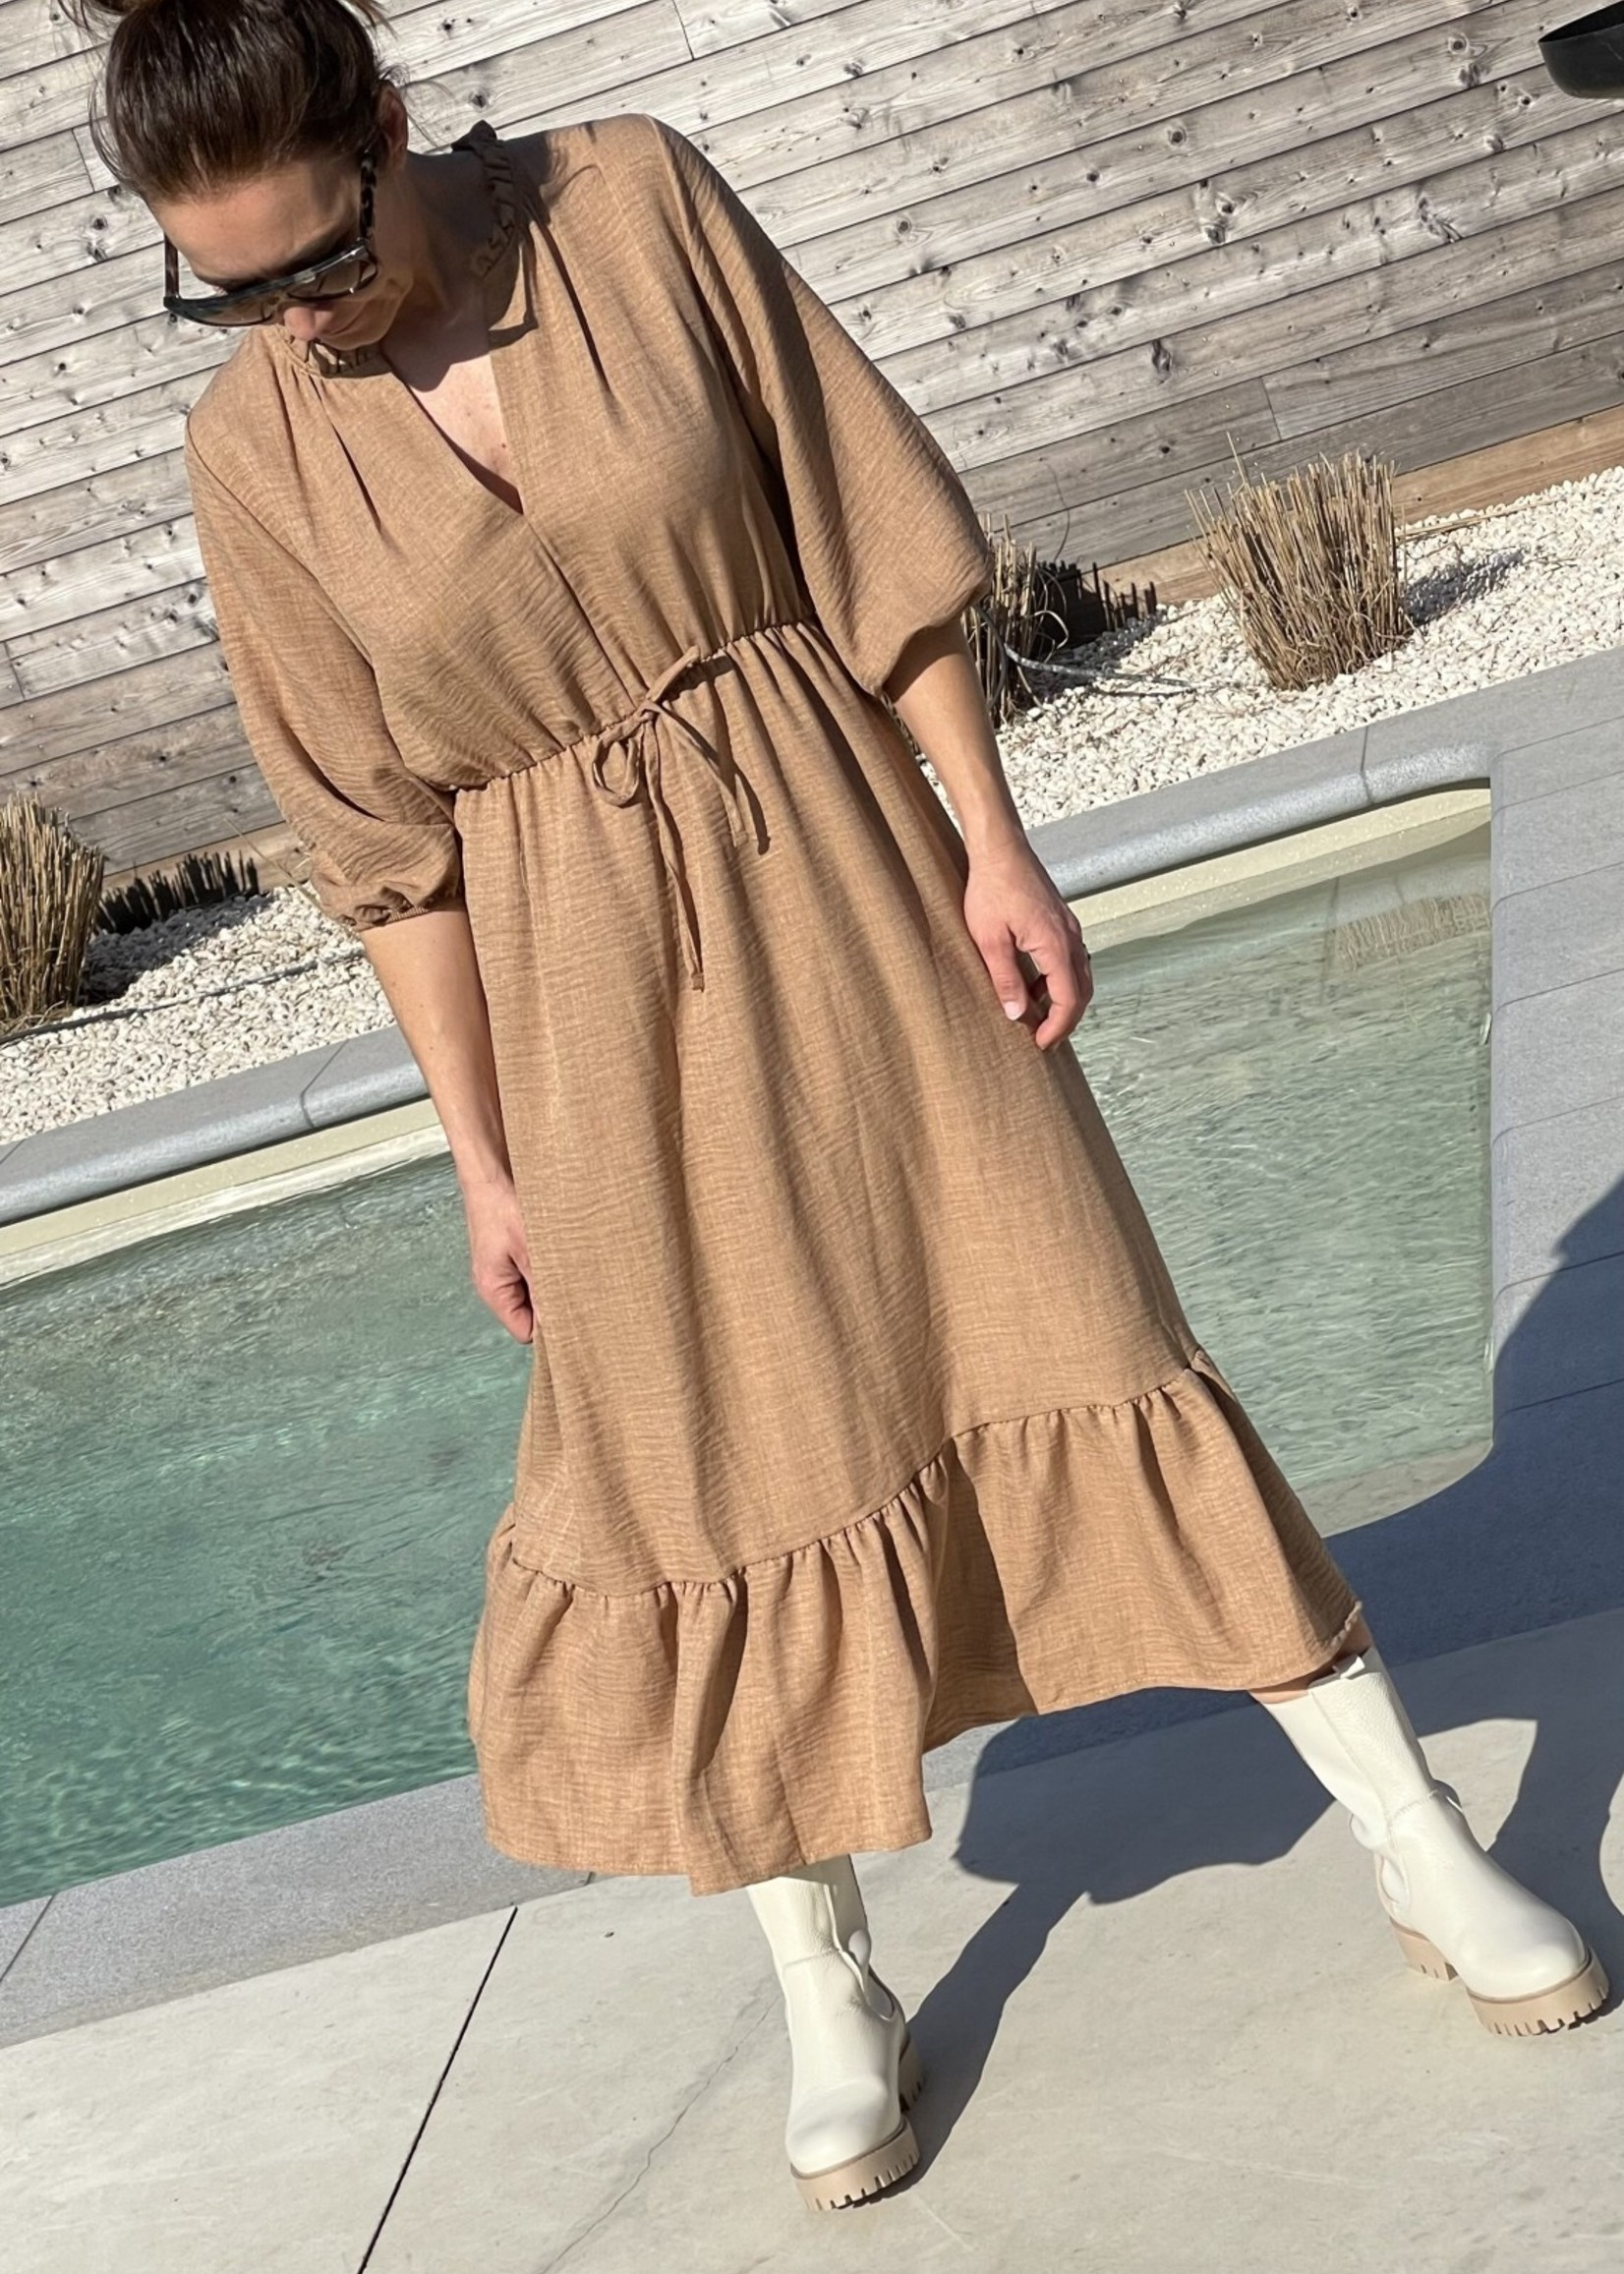 Guts & Goats Valentina Camel Dress